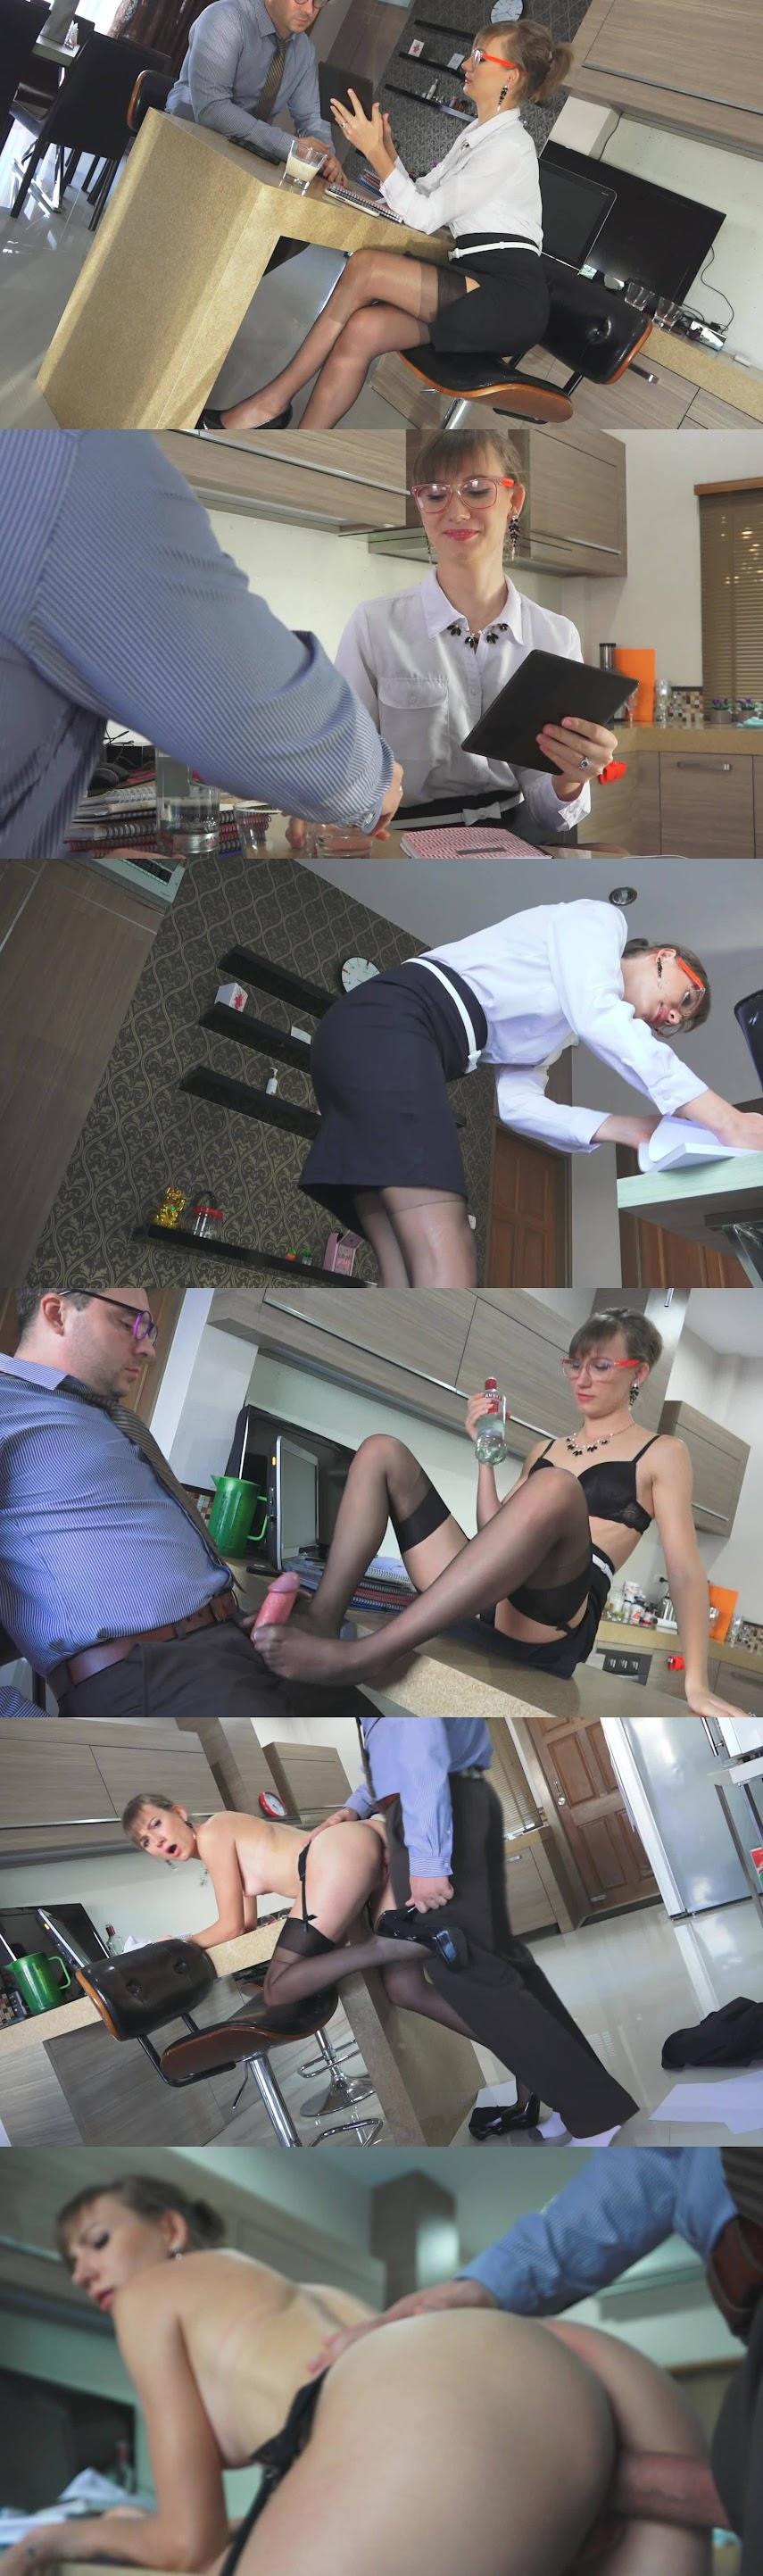 2017.01.18 308 Drunken Business Woman 1080p